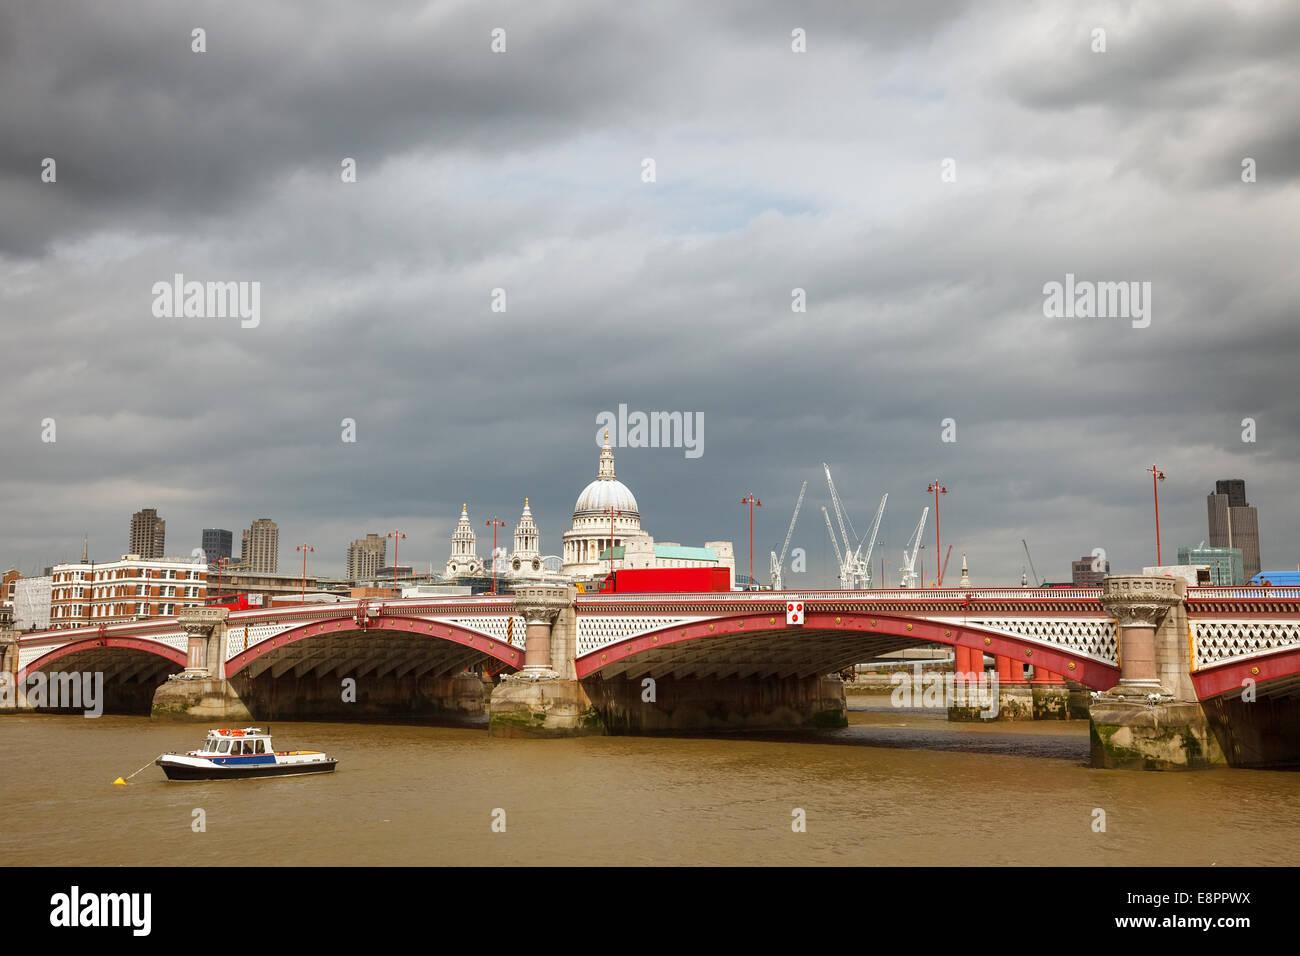 Blackfriar's Bridge, London - Stock Image